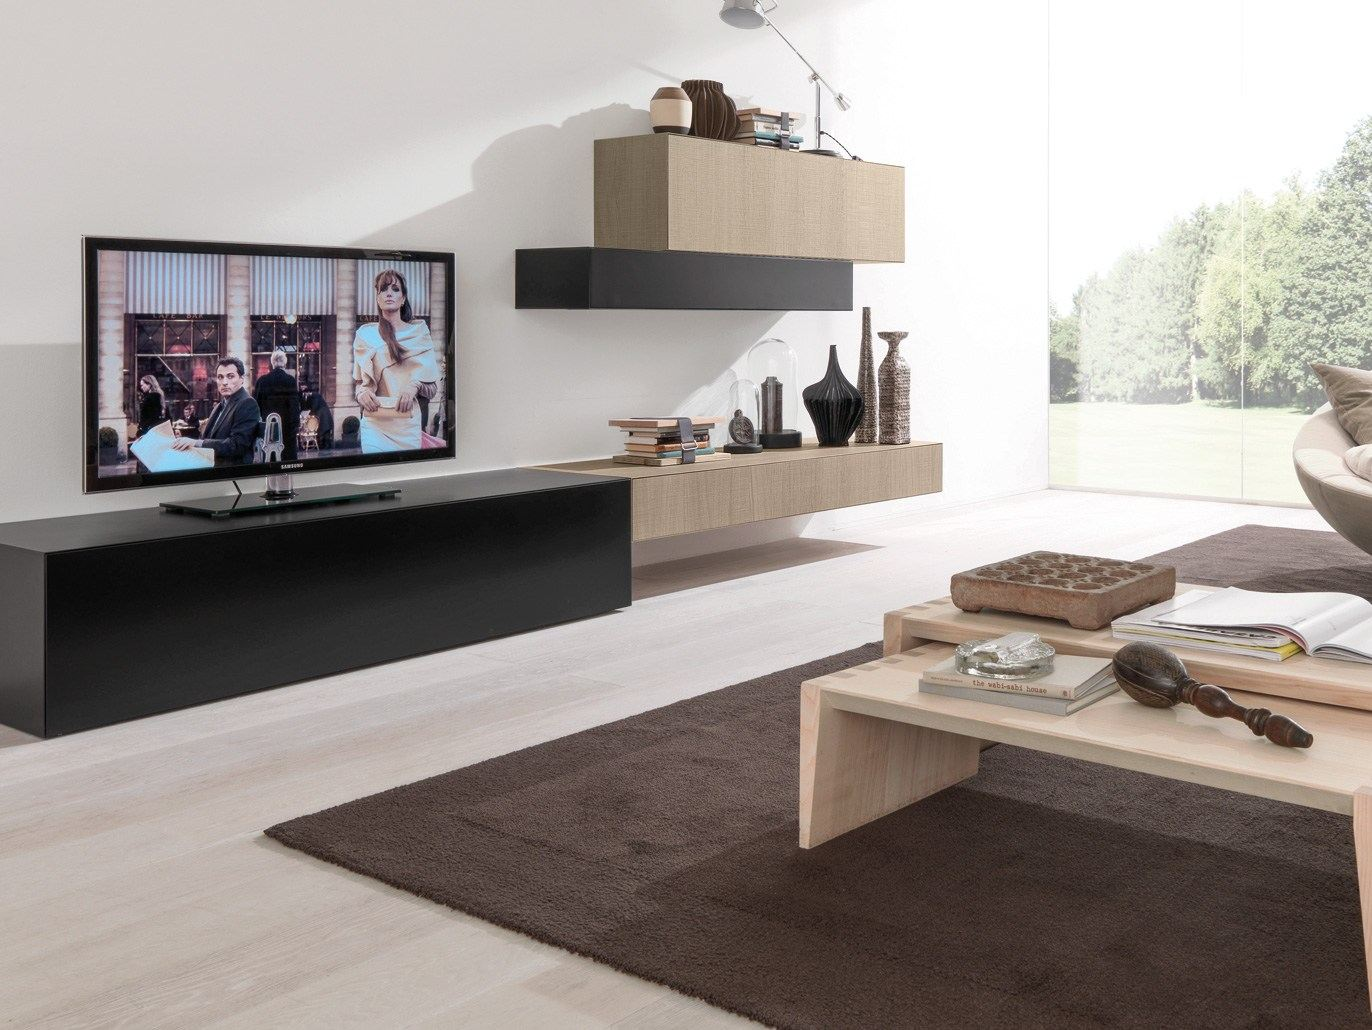 Meuble Tv Mural Slim Une Exclu Atylia Artzein Com # Meuble Tv Atylia